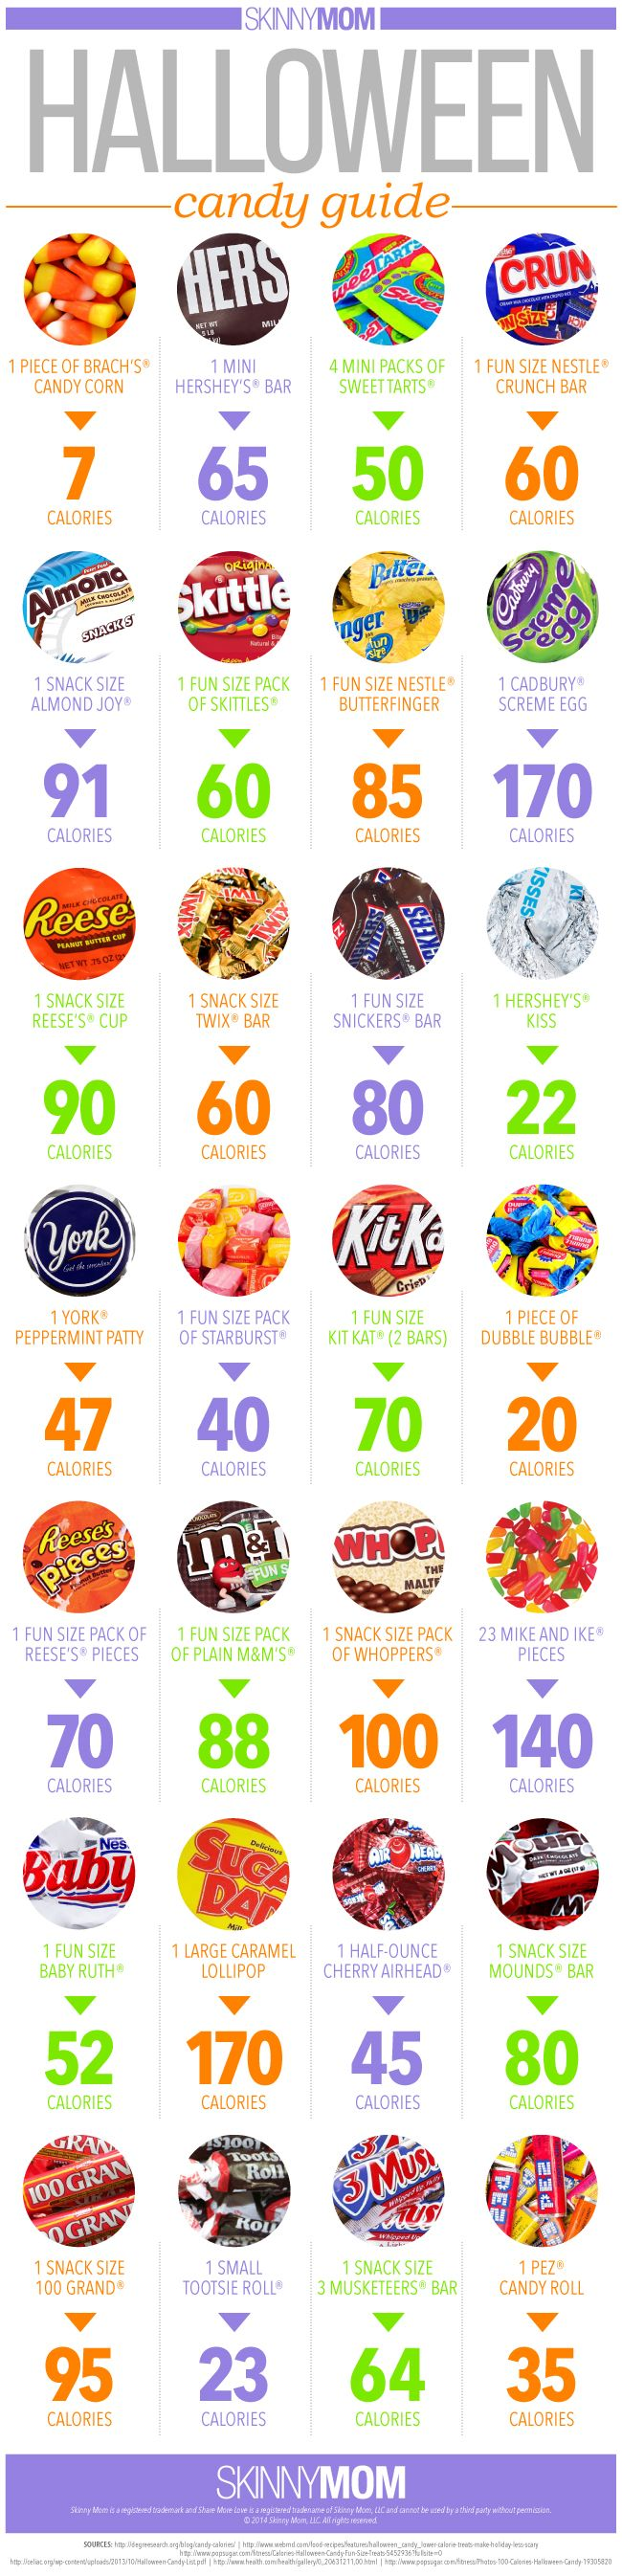 Fun Size Kit Kat Calories : calories, Halloween, Candy, Calorie, Count!, Candy,, Skinny, Healthy